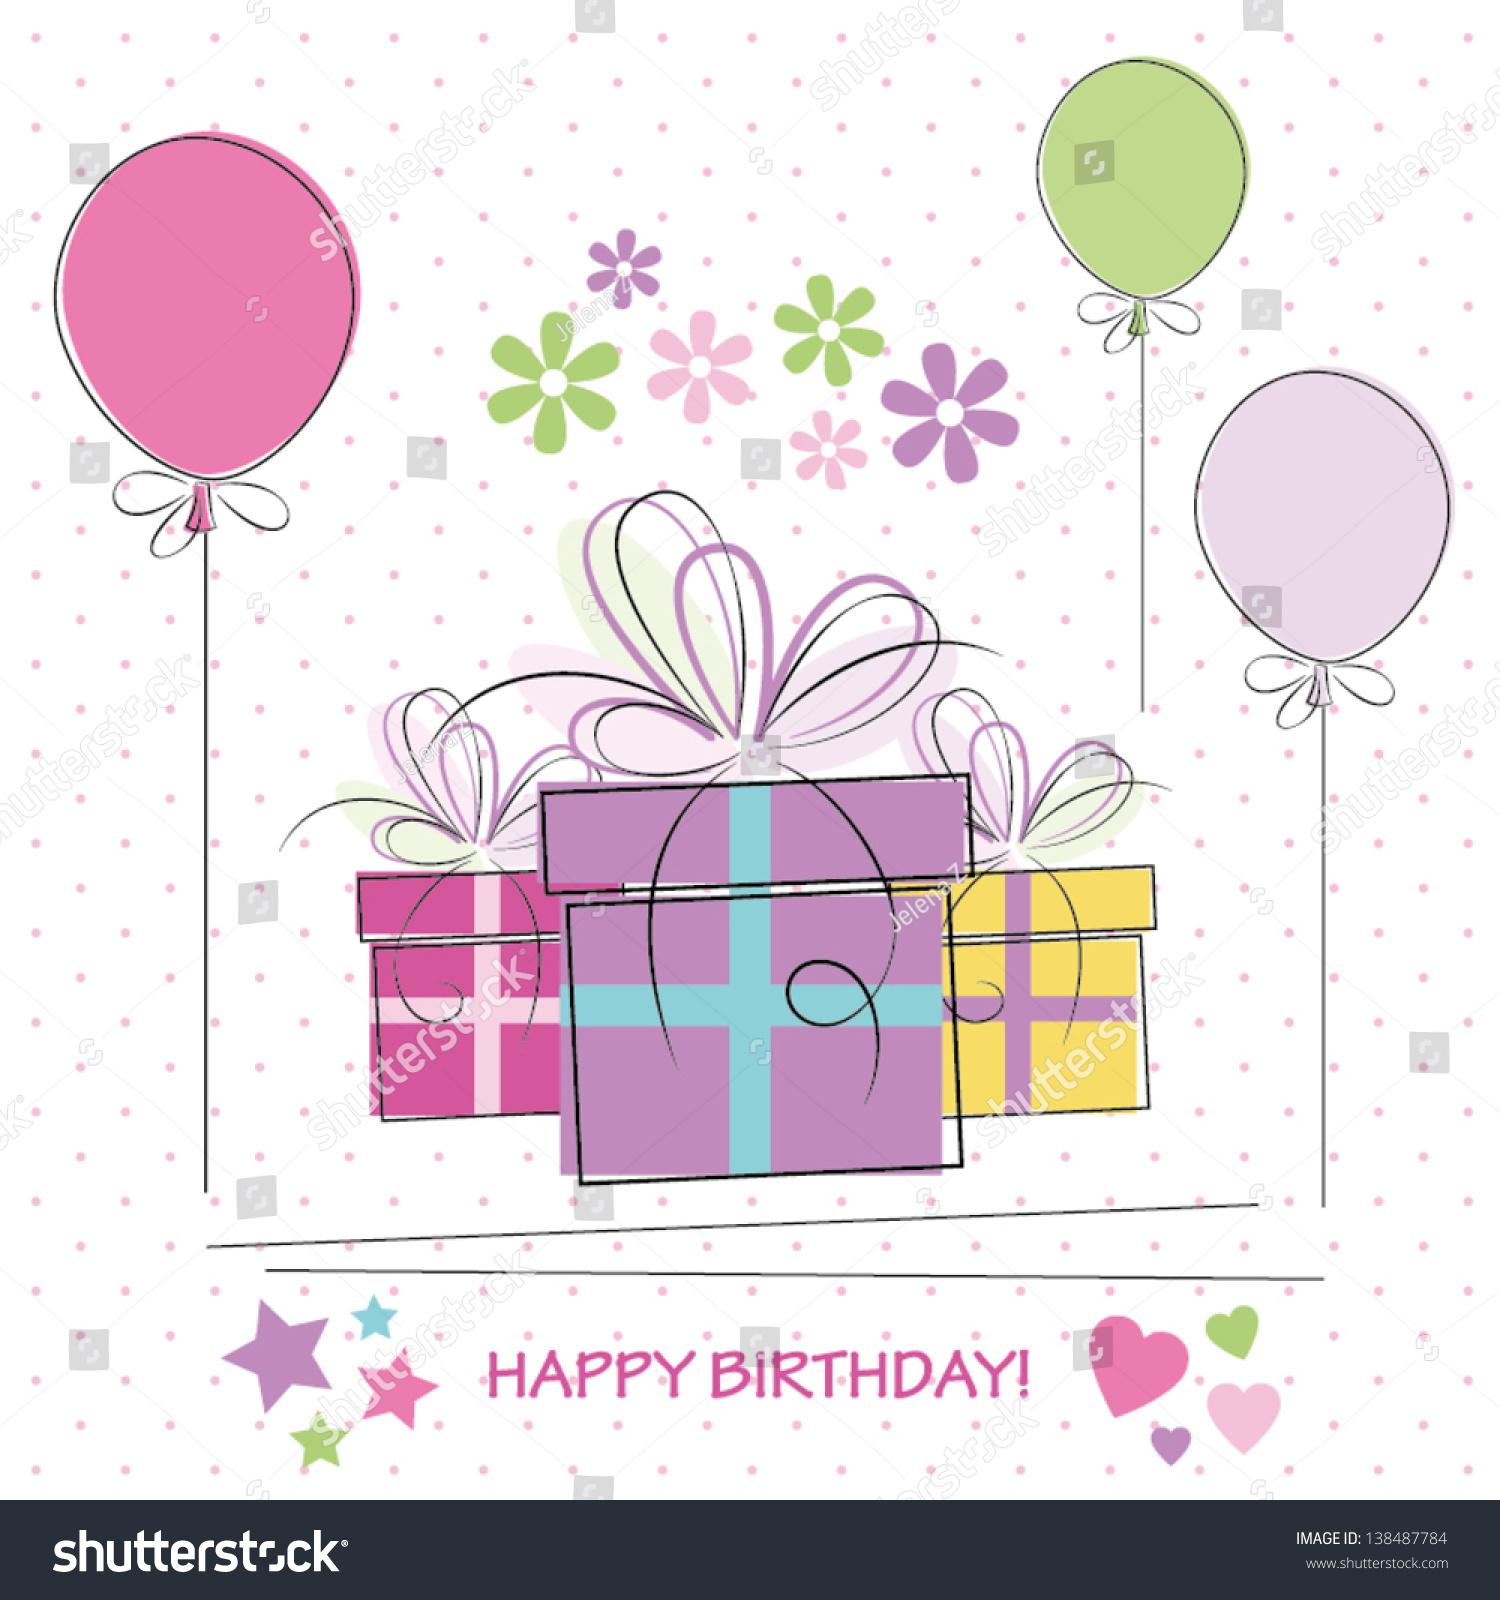 Cute Happy Birthday Card Vector 138487784 Shutterstock – Happy Birthday Cards Cute